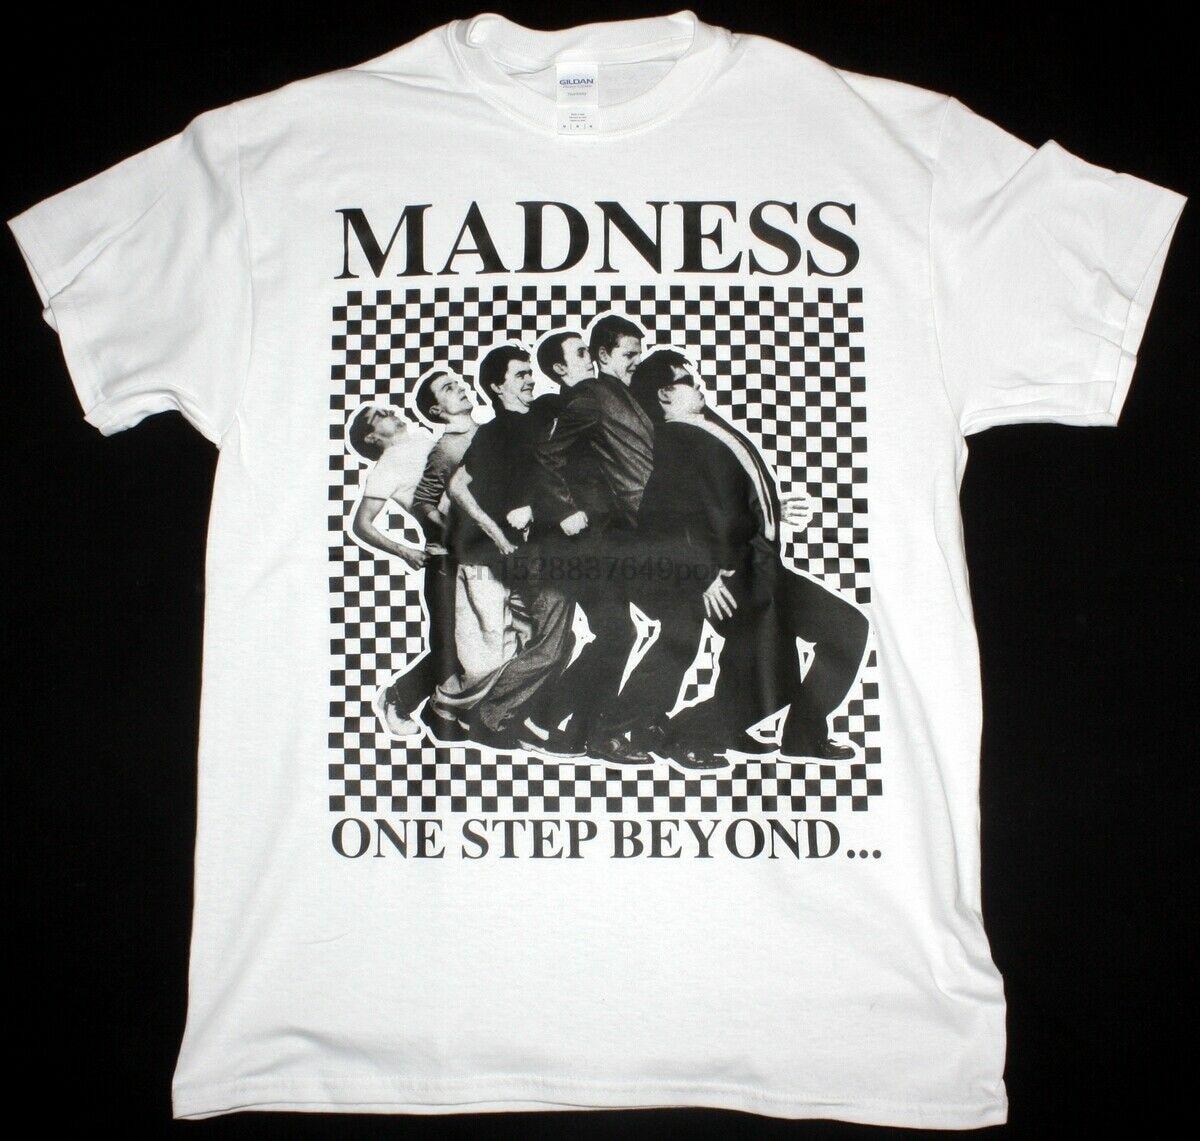 Madness One Step Beyond English Band Album Cover Kids Boy Girl Gift T Shirt 906